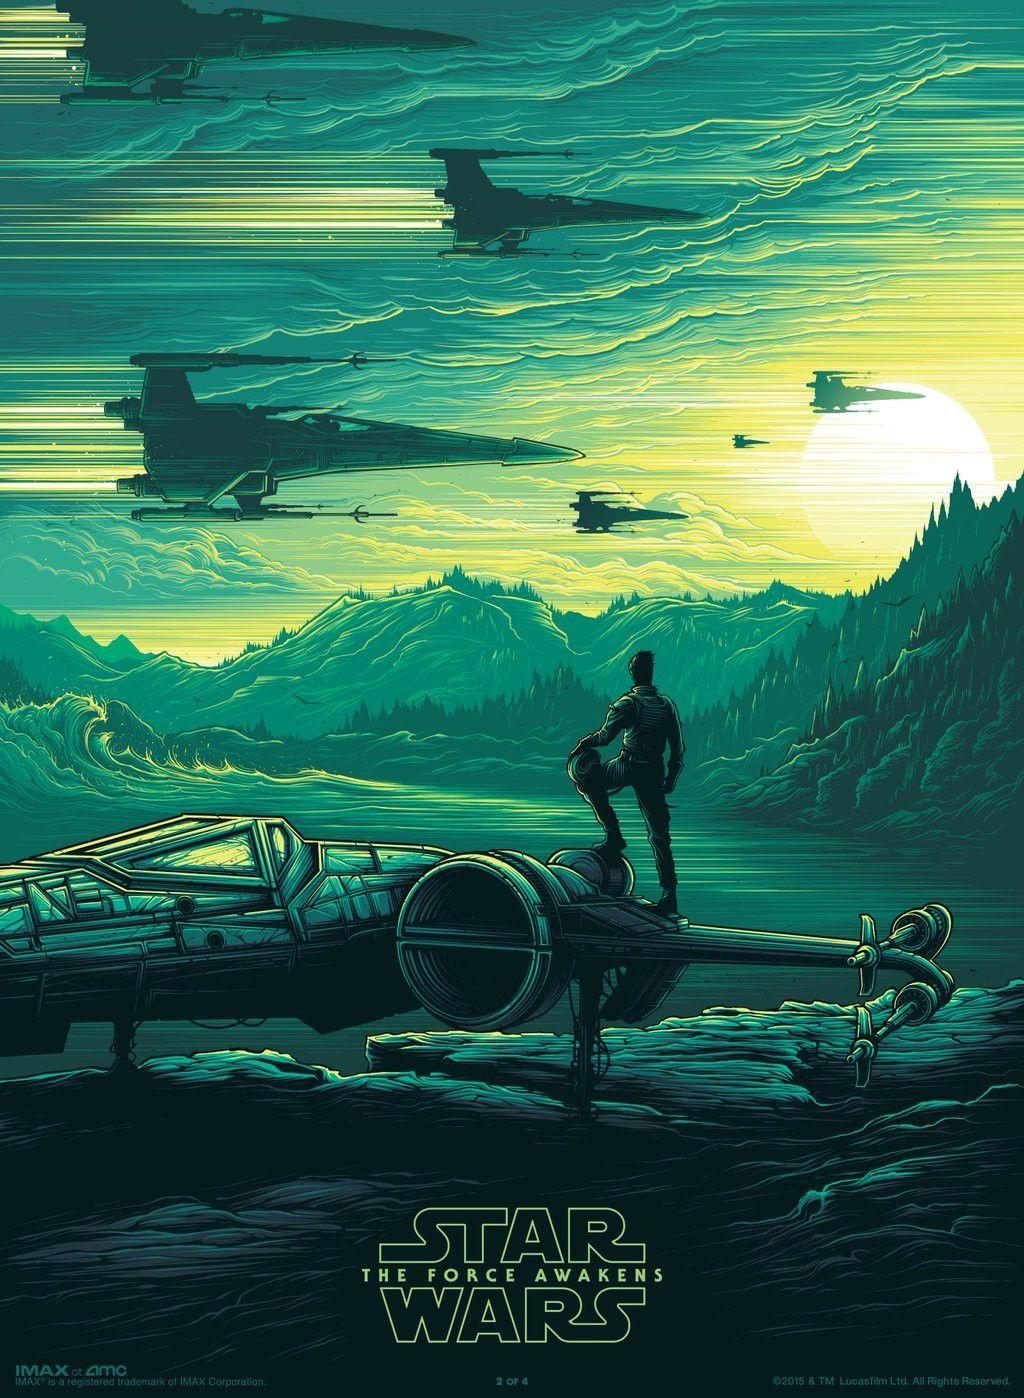 Star Wars The Force Awakens Poster 23 Cinejab Star Wars Vii